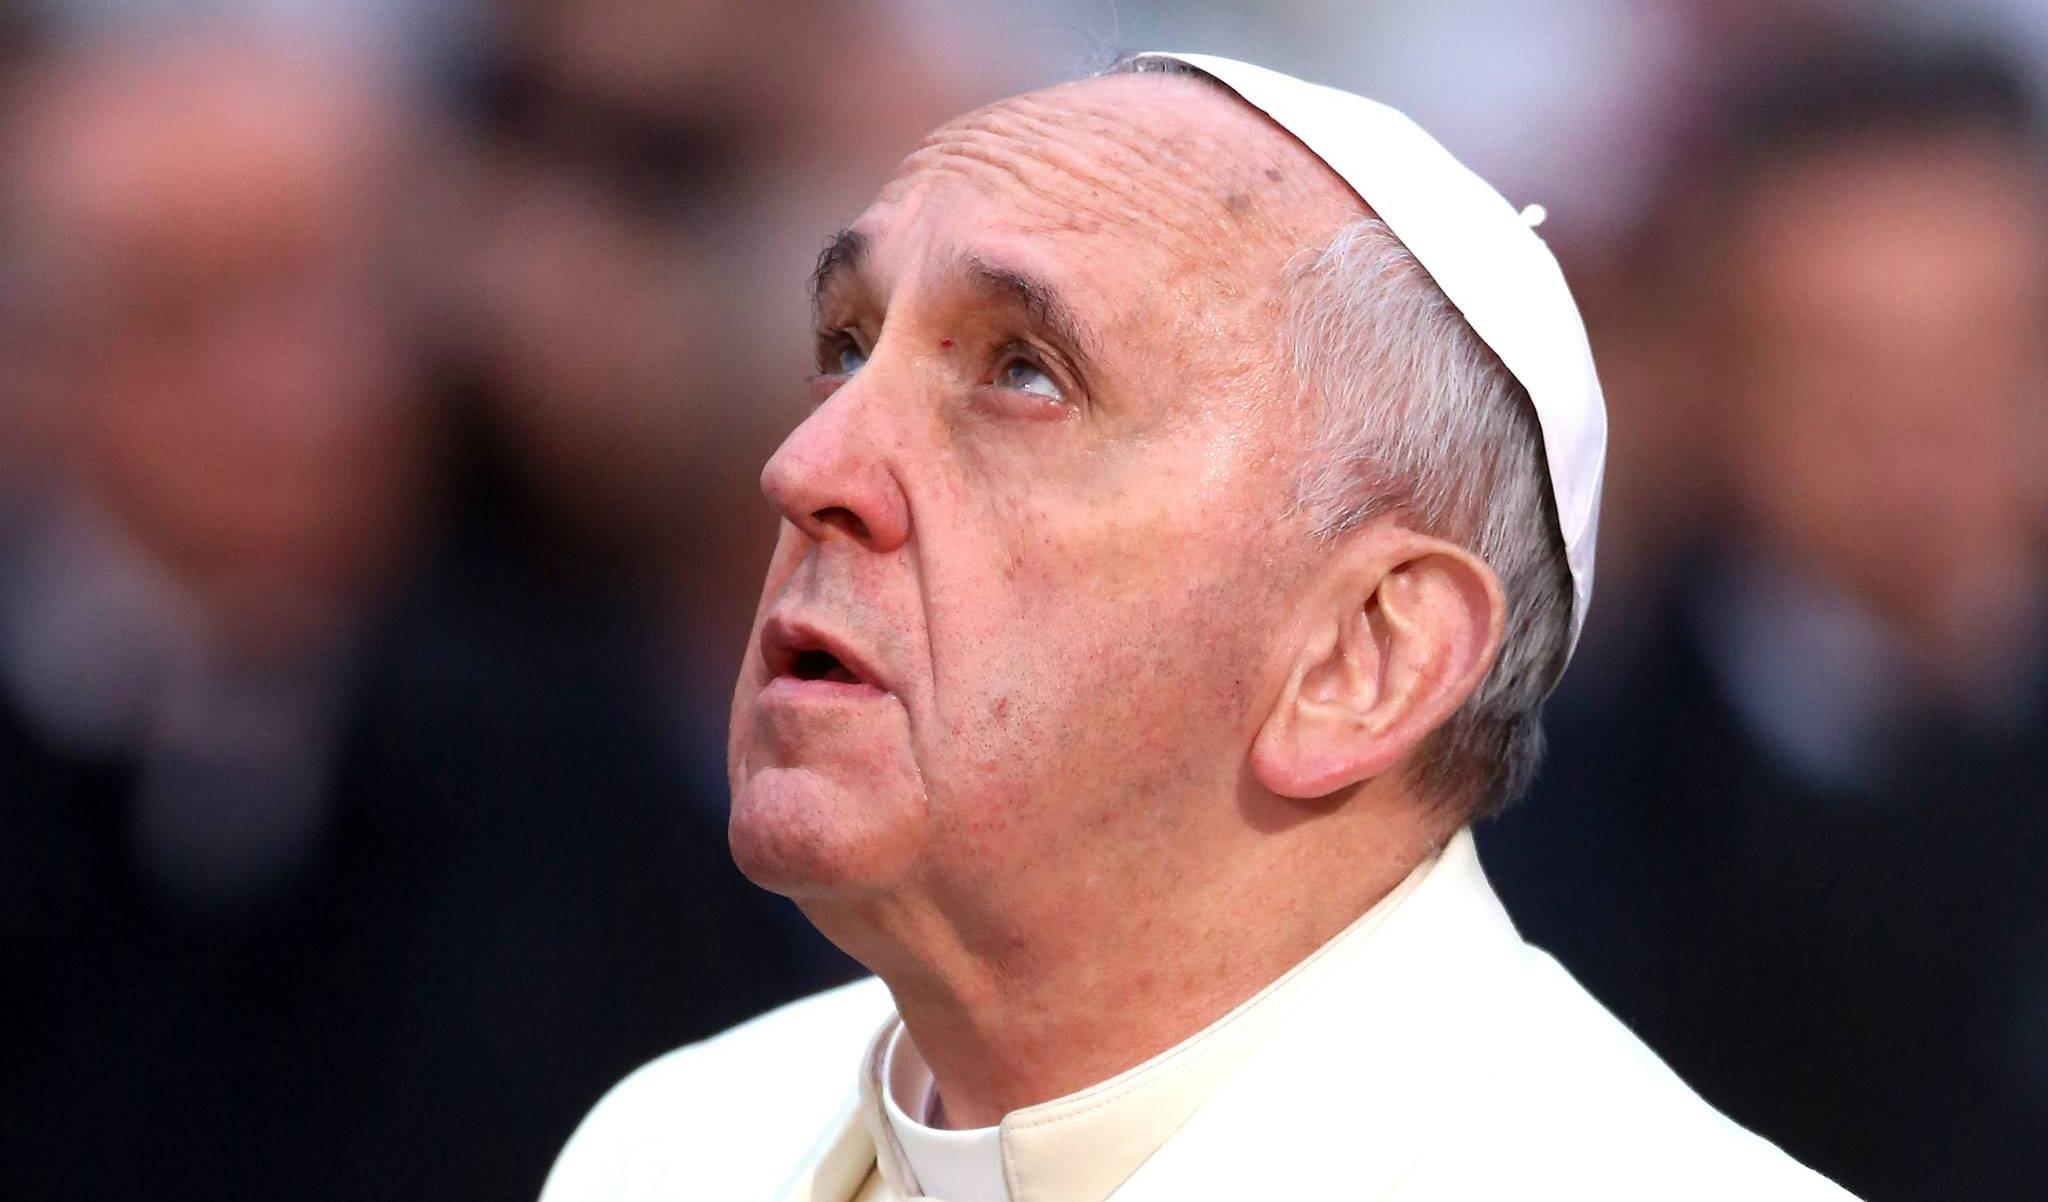 A Rabbi's Response To Pope Francis's Holocaust Comparison